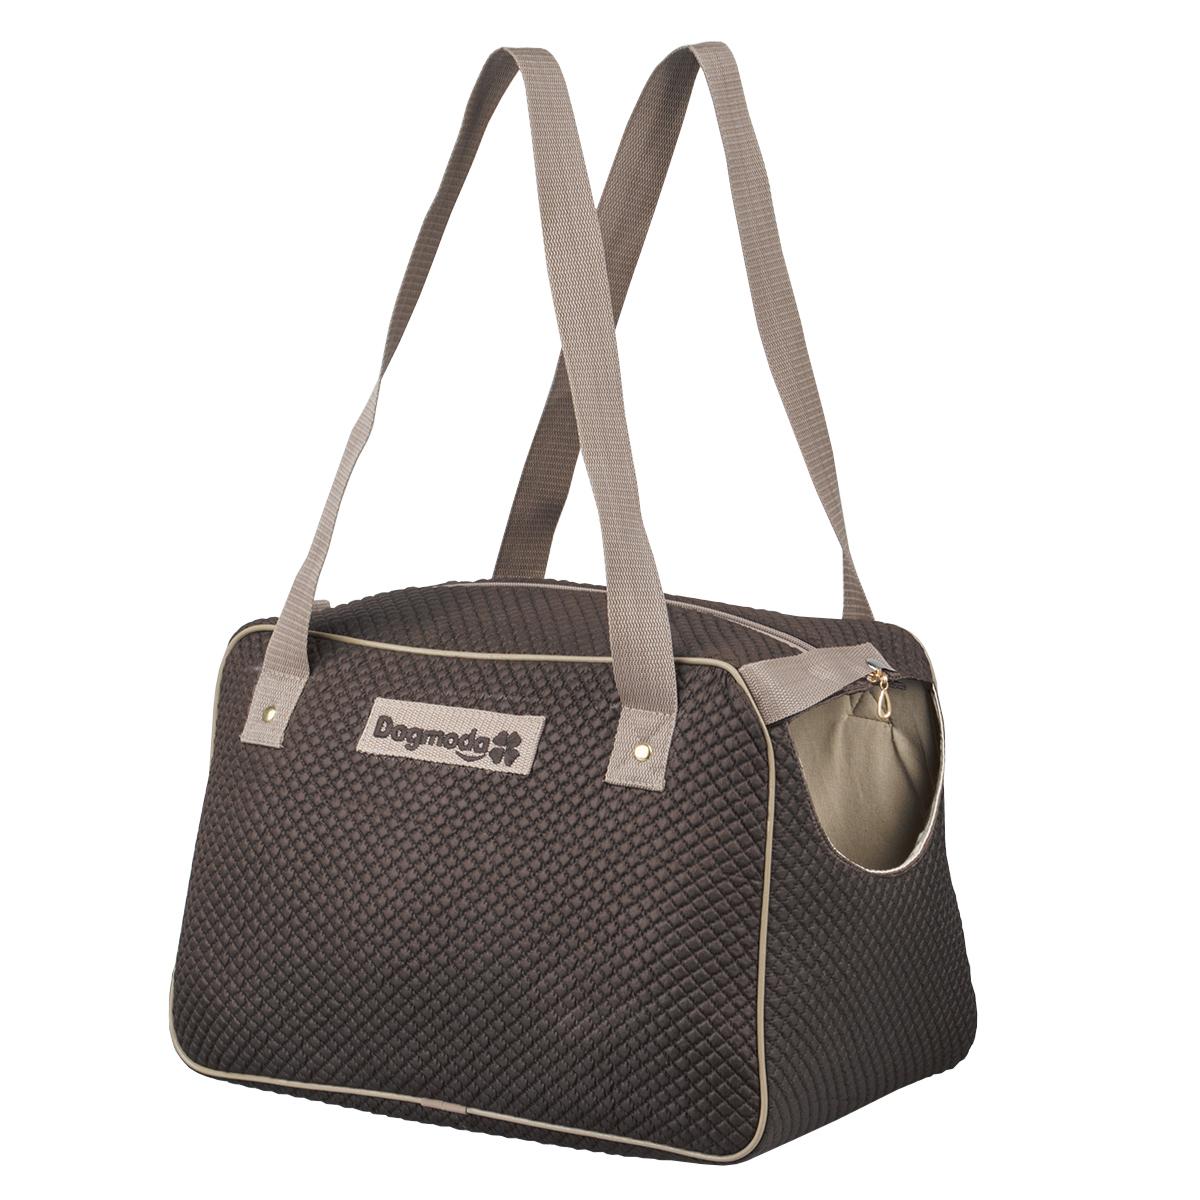 Сумка-переноска для животных Dogmoda Ирис, 36 х 22 х 25 см зооник сумка переноска для животных 32 36 47см